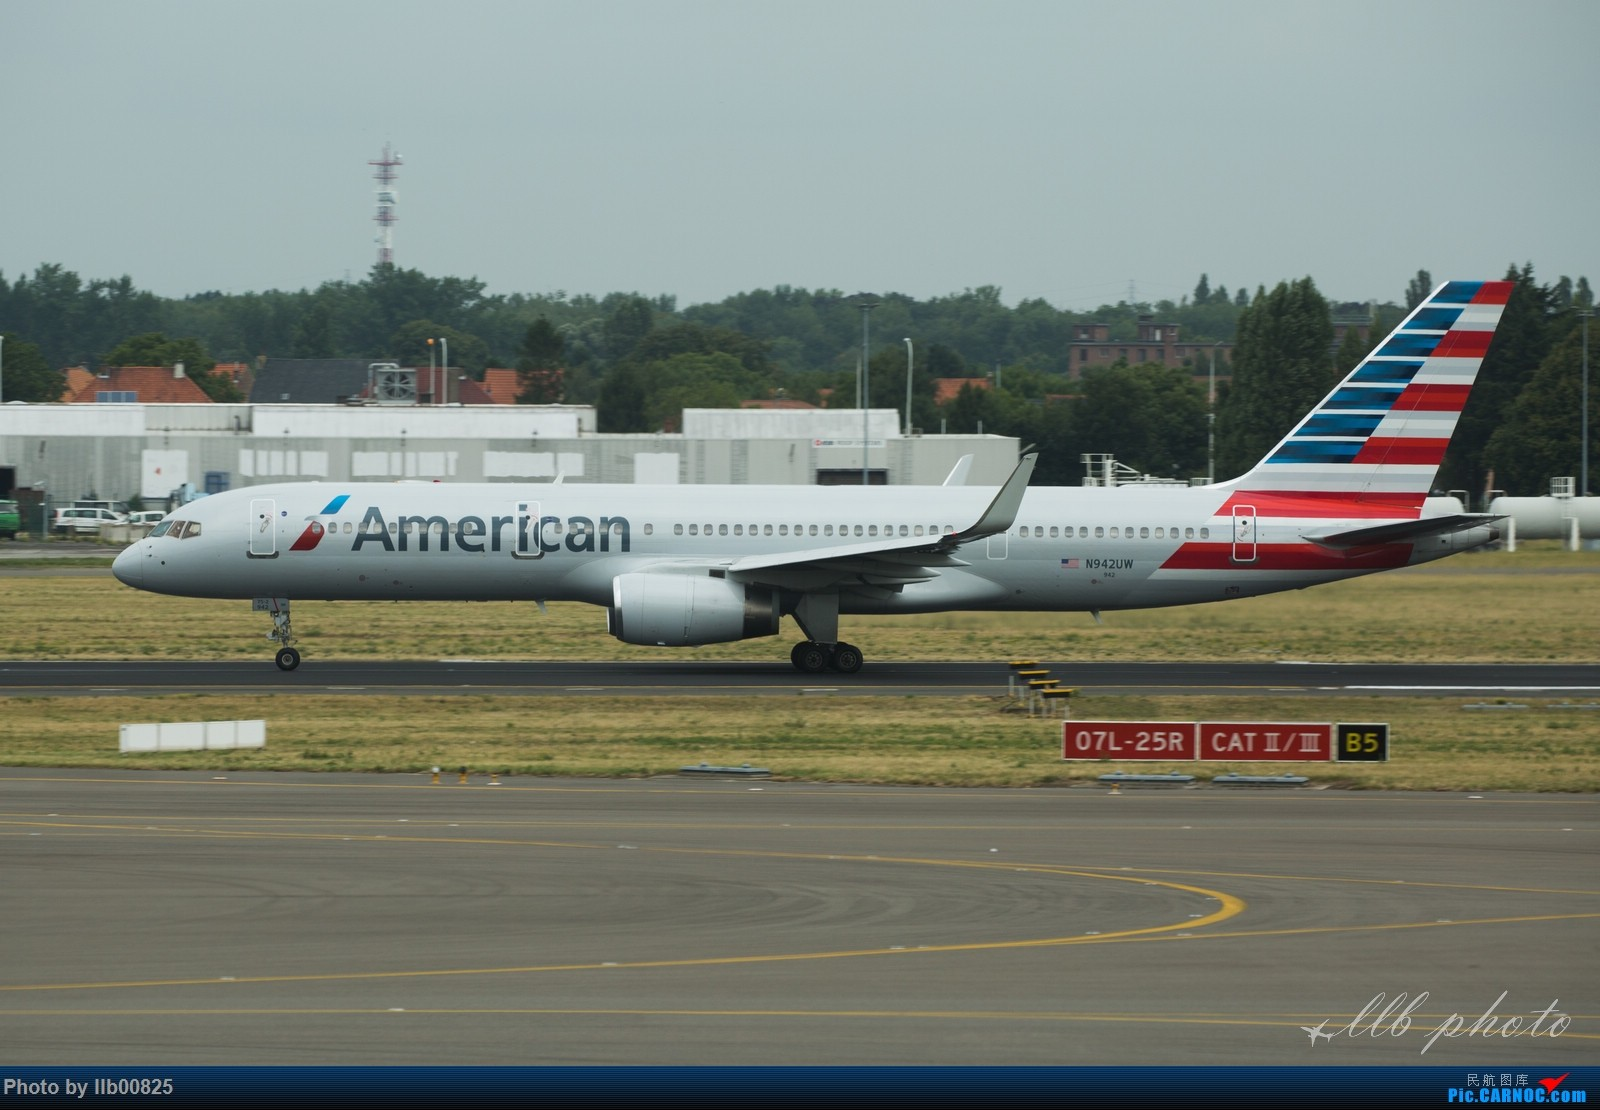 Re:[原创]赫尔辛基-布鲁塞尔一些杂图 BOEING 757-200 N942UW 比利时布鲁塞尔机场